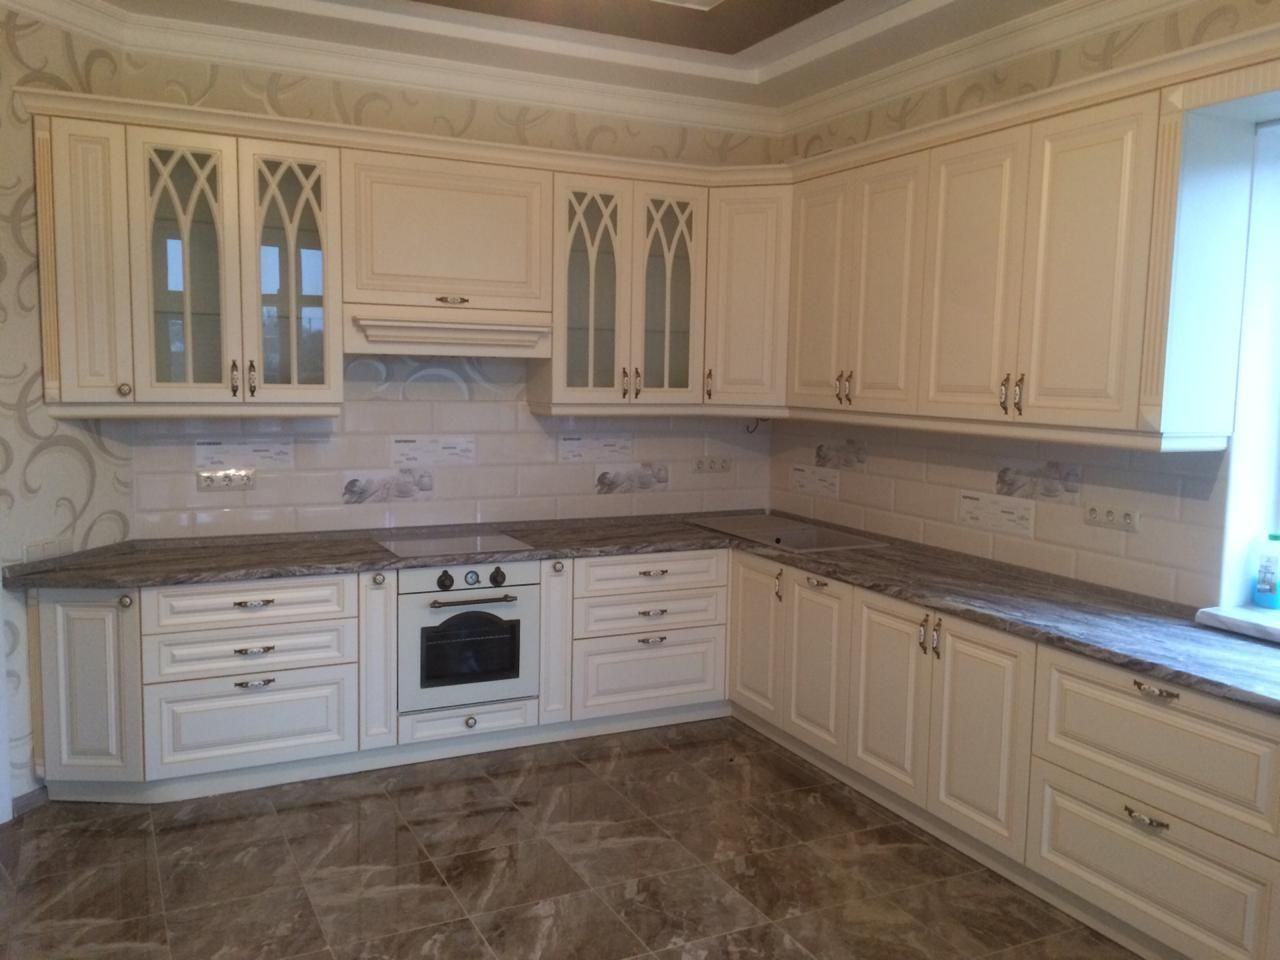 Pin By Visy Pal On Interer Sreda Obitaniya In 2020 Kitchen Cabinets Kitchen Decor